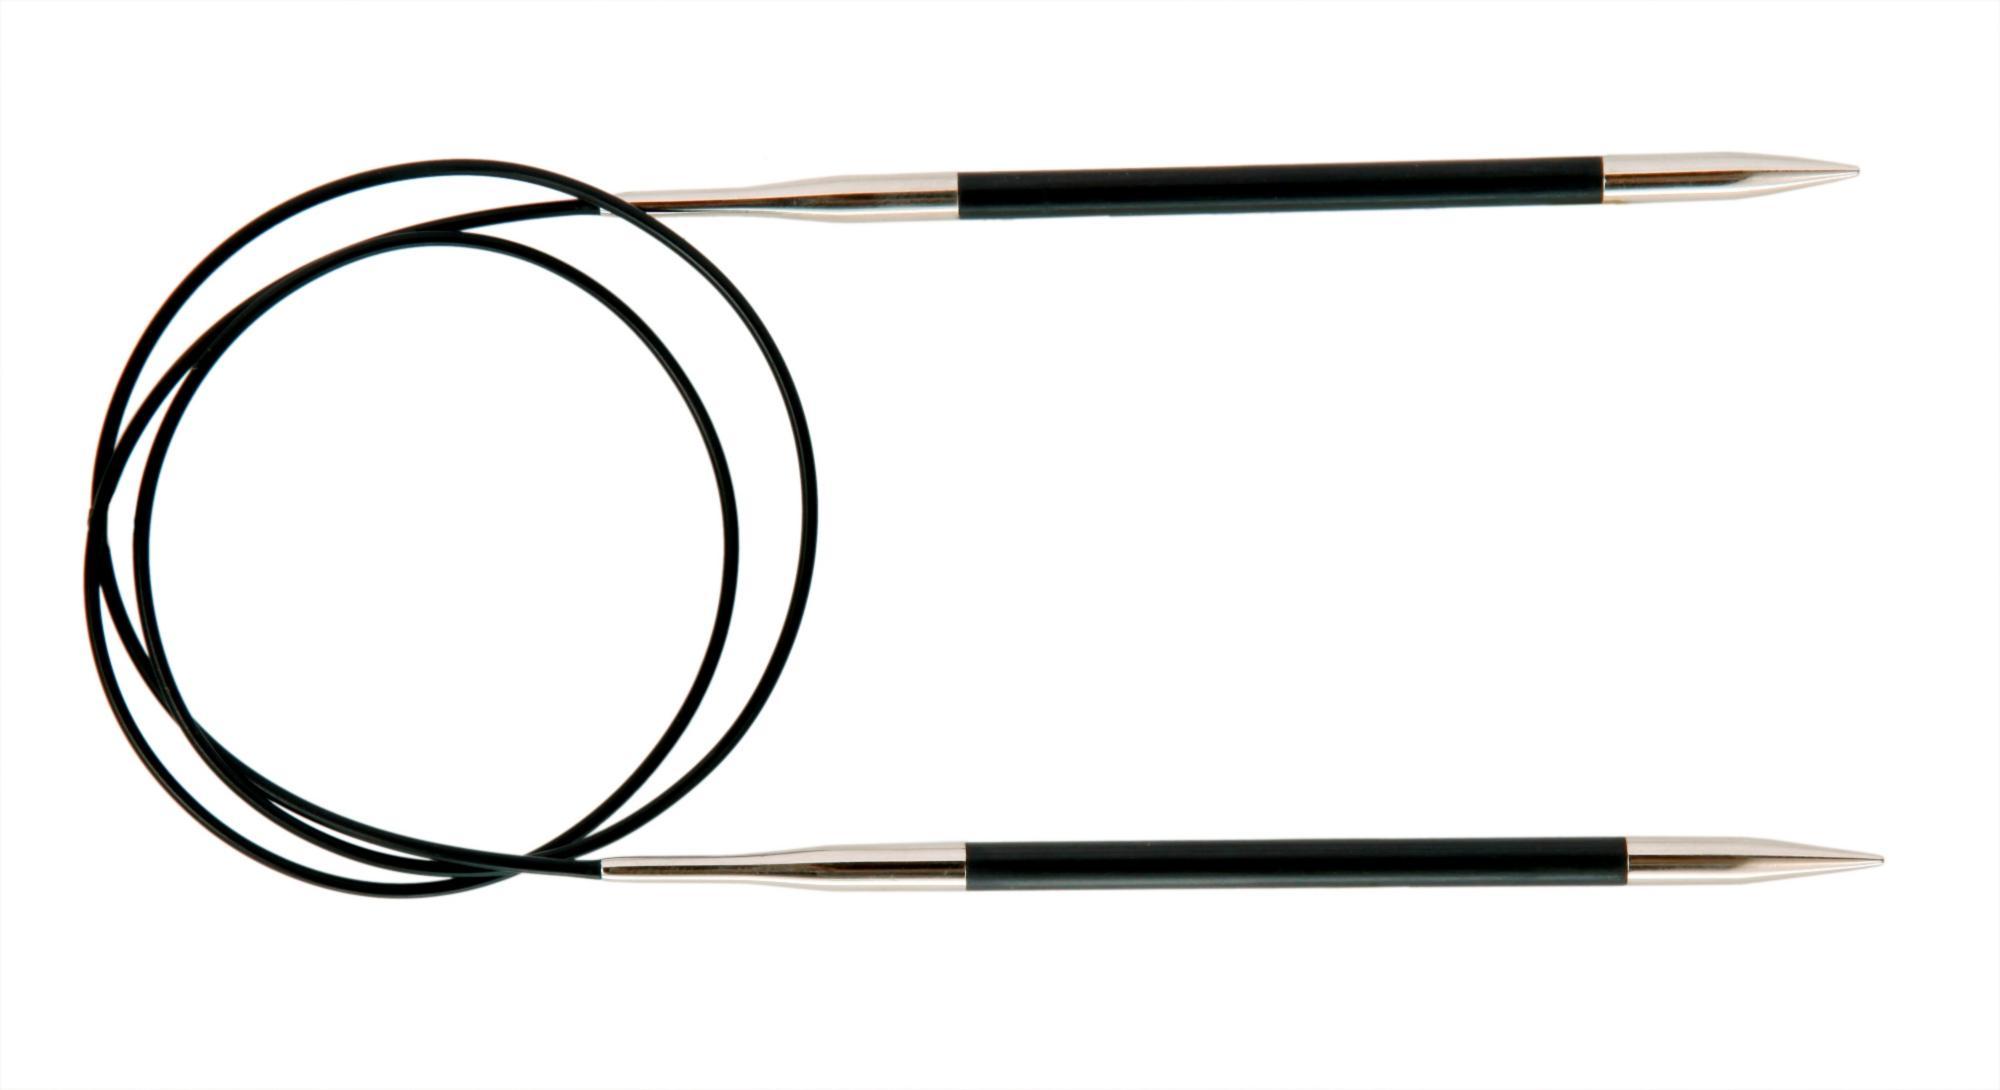 Спицы круговые 60 см Karbonz KnitPro, 41173, 6.50 мм